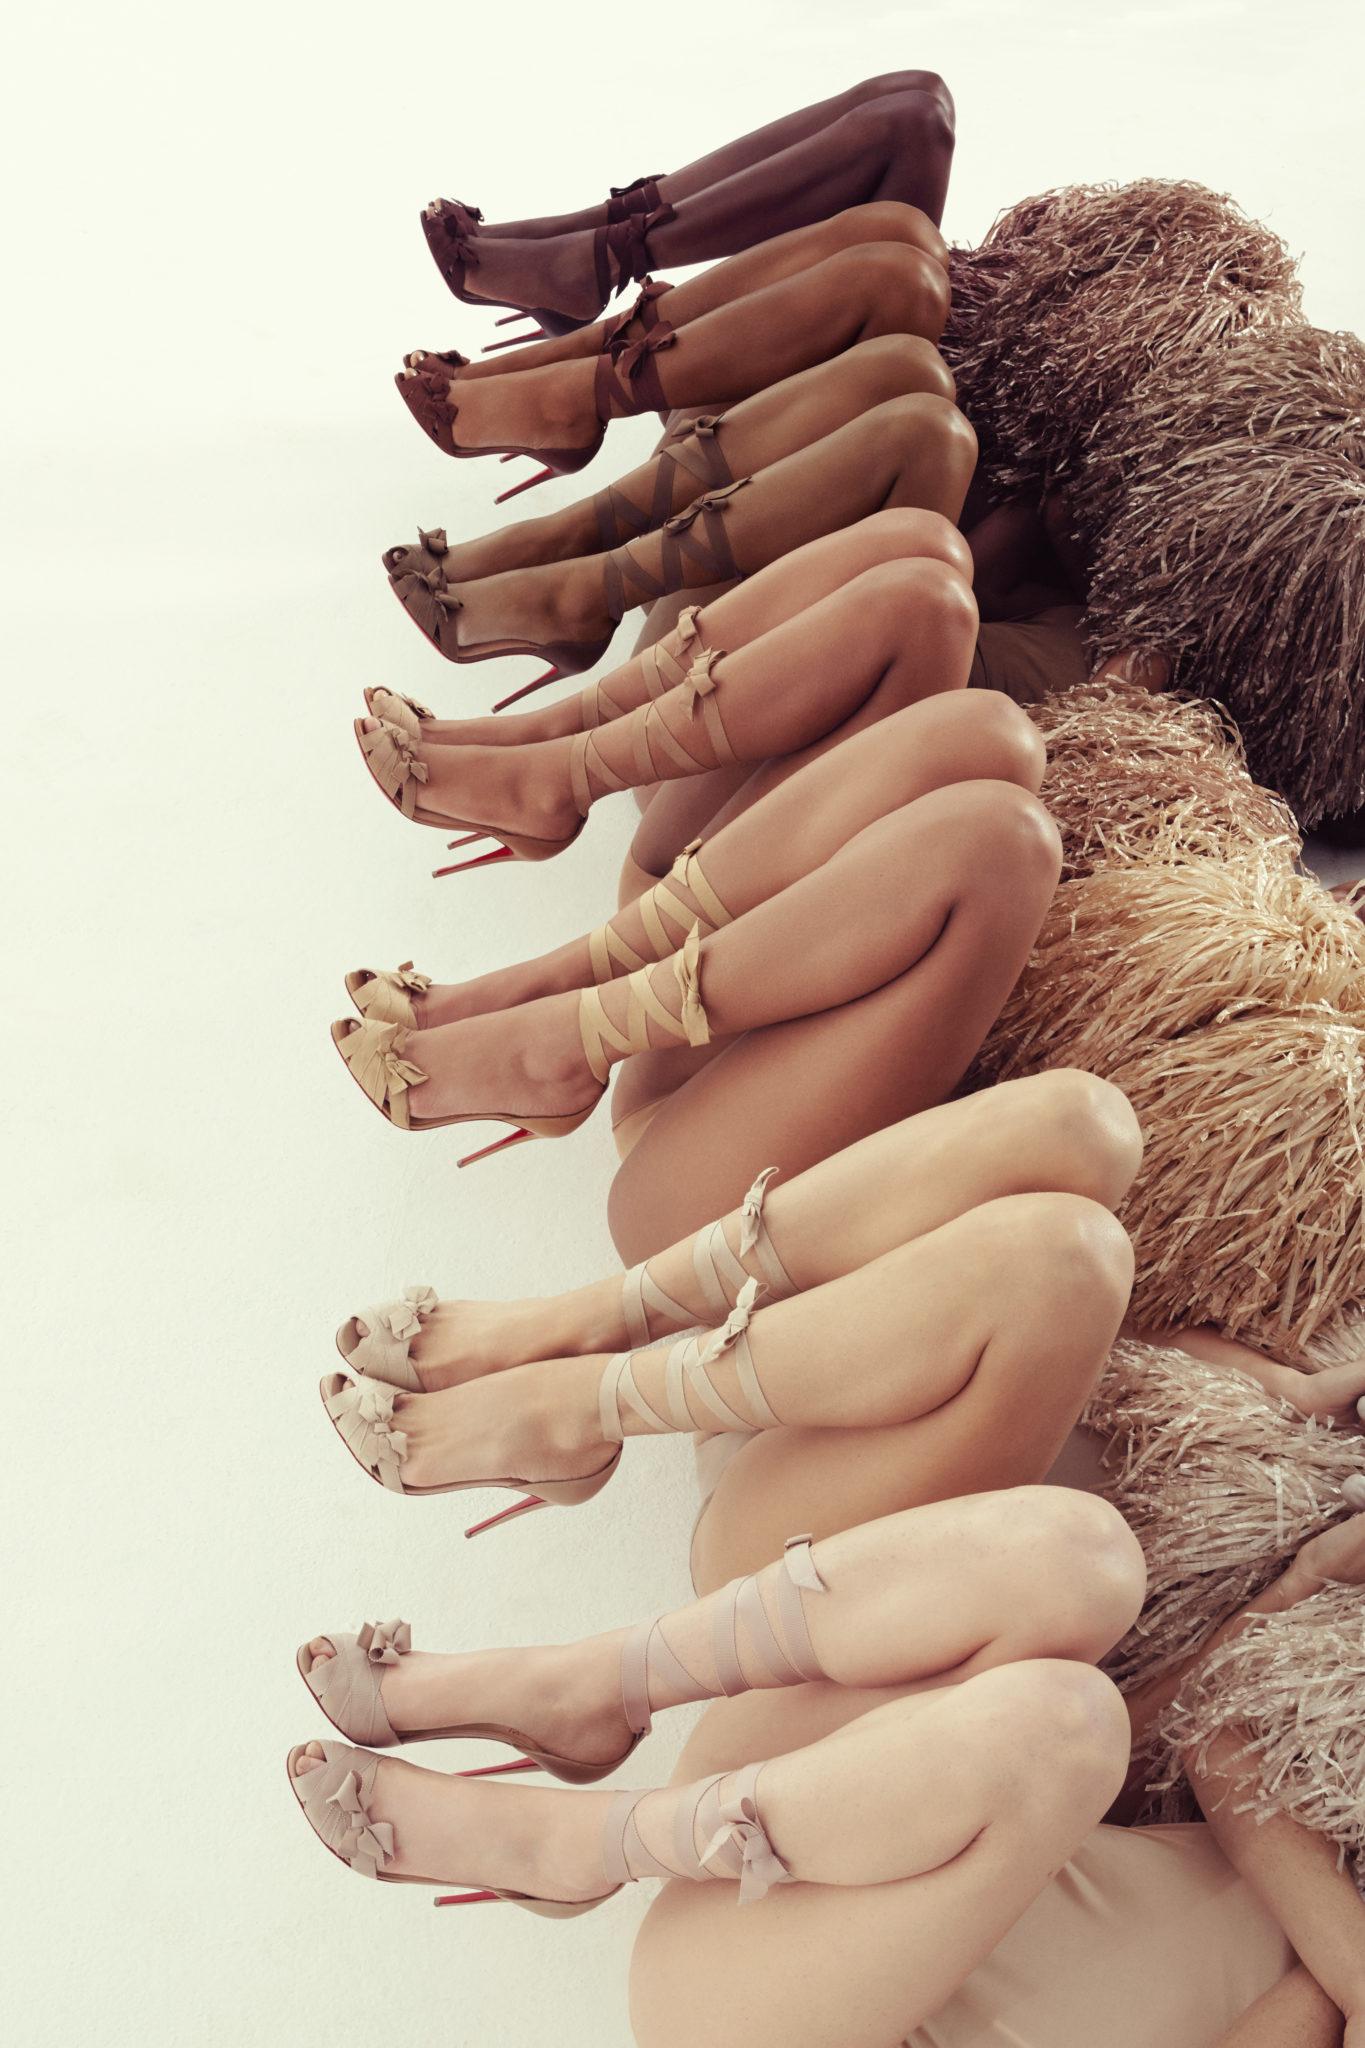 Christian louboutin nude flats skin tones